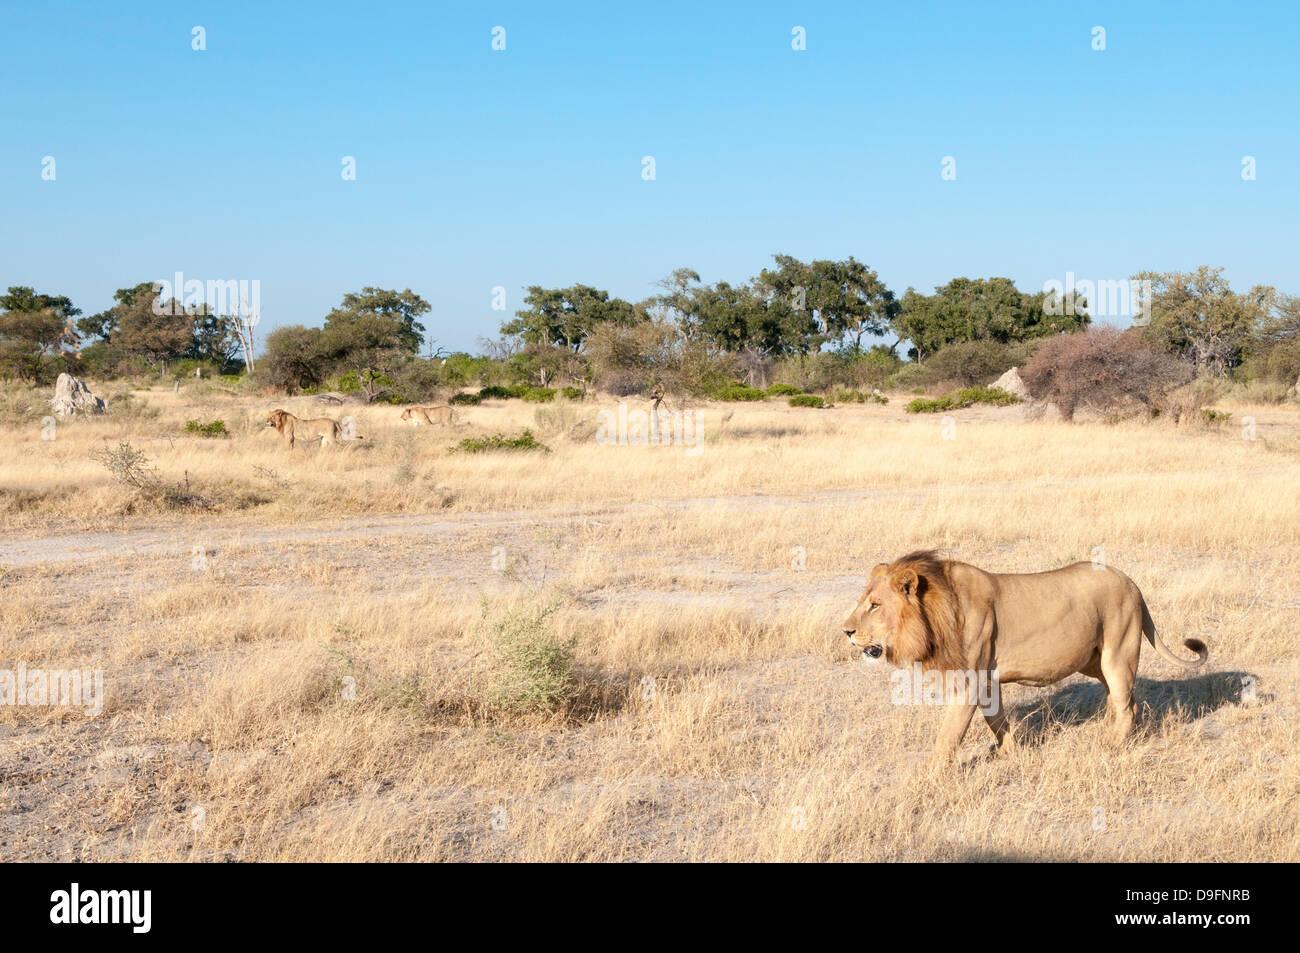 Lions (Panthera leo), Chief Island, Moremi Game Reserve, Okavango Delta, Botswana, Africa - Stock Image